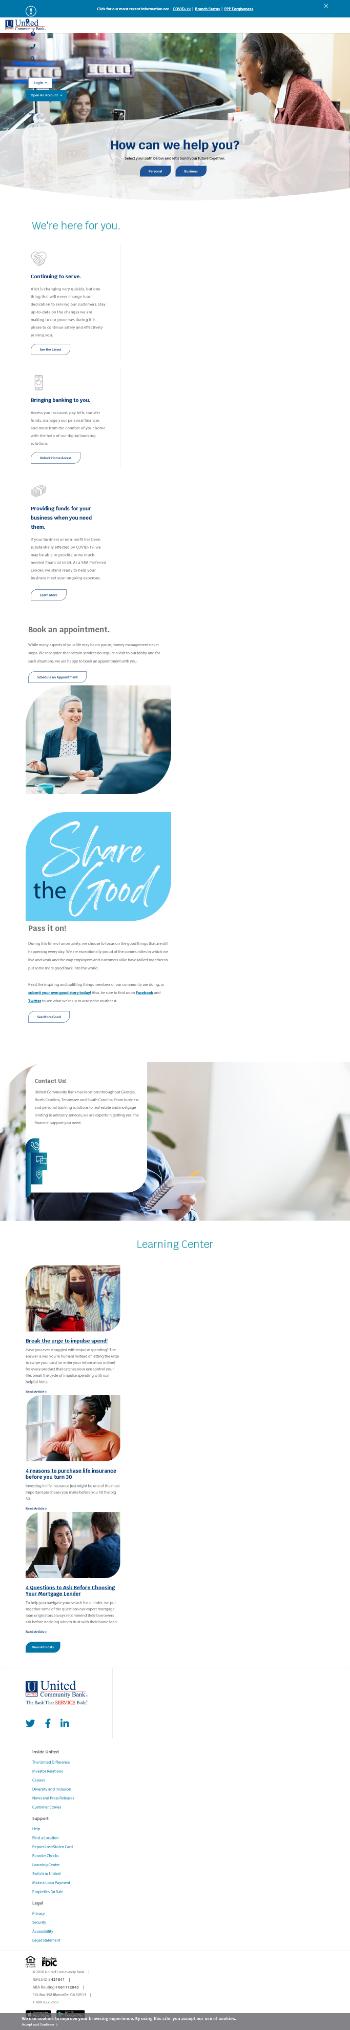 United Community Banks, Inc. Website Screenshot